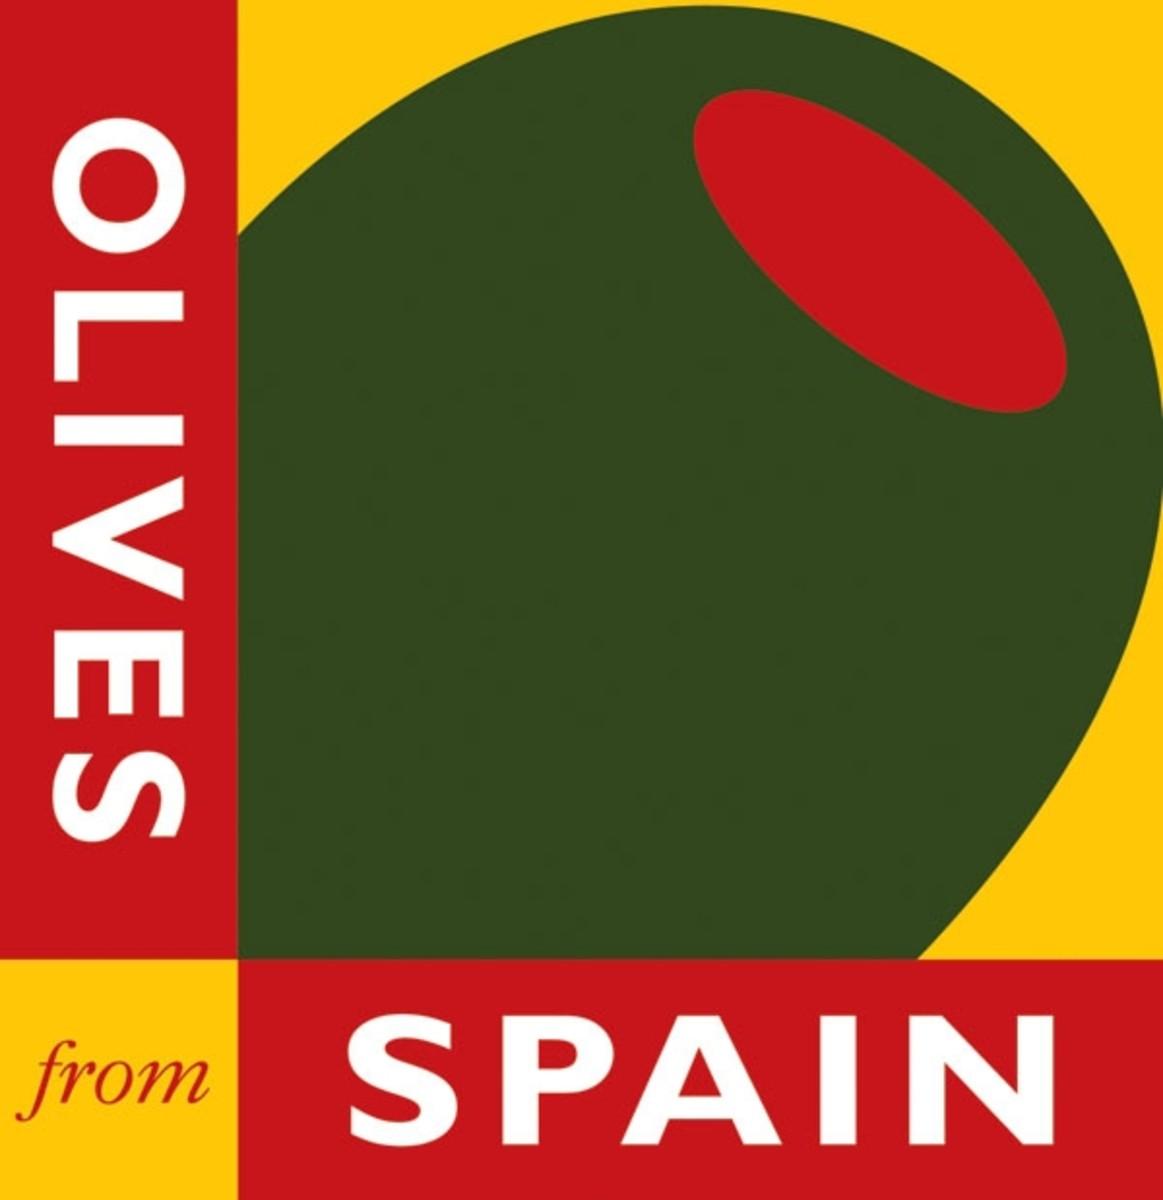 olivesfromspain